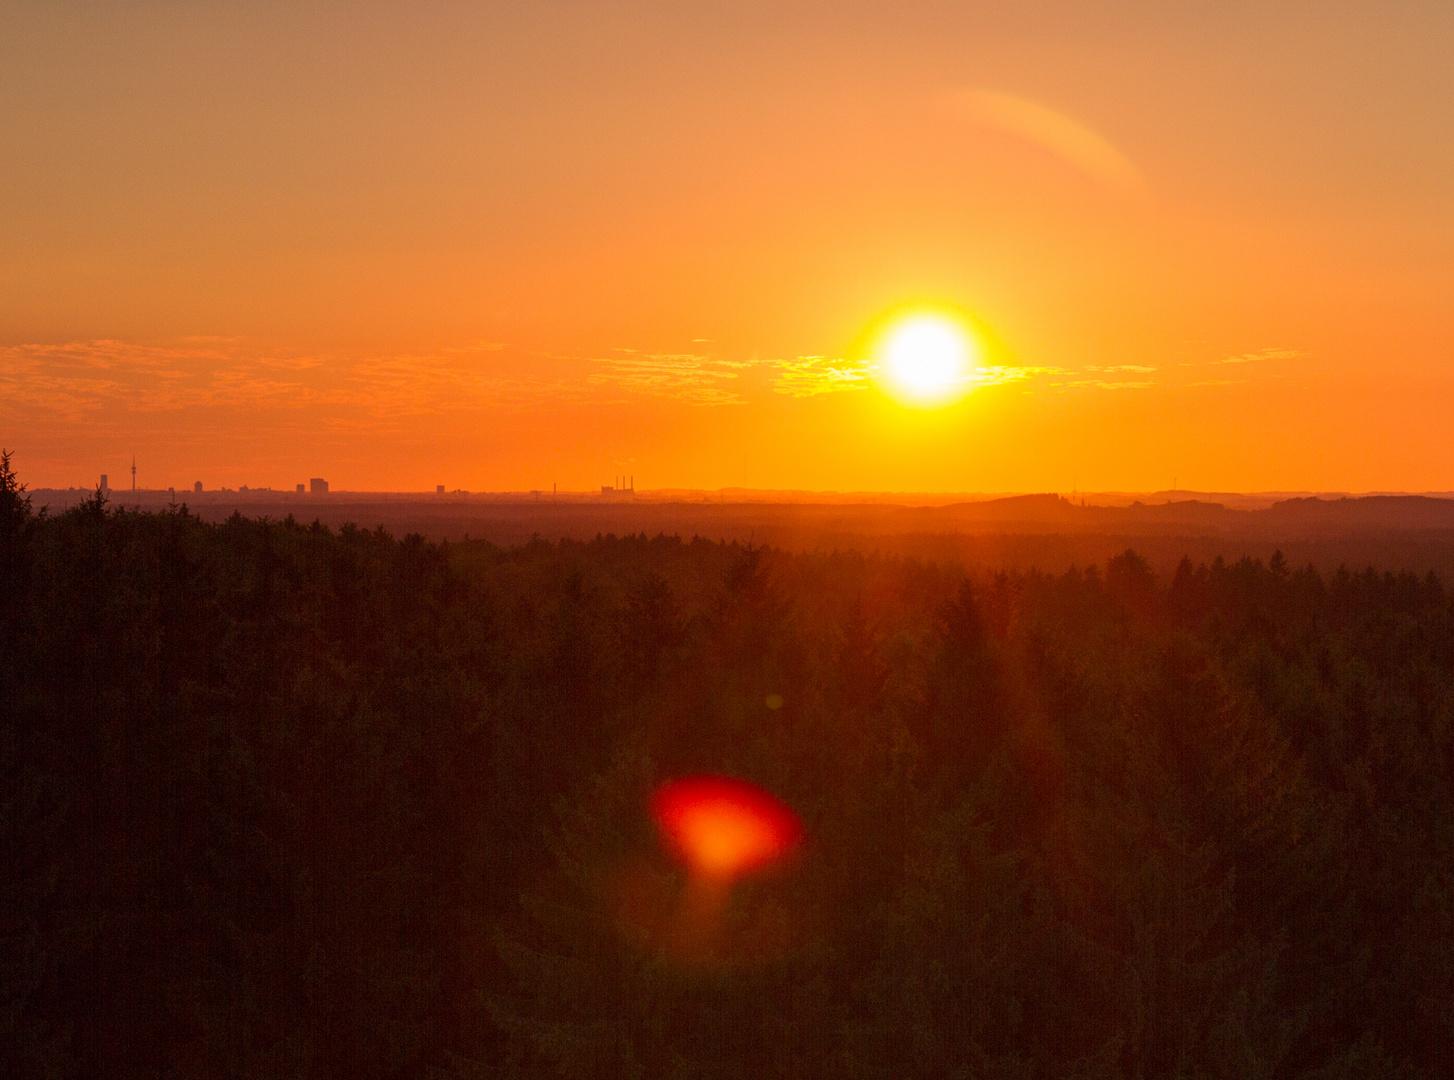 Sonnenuntergang über dem Ebersberger Forst